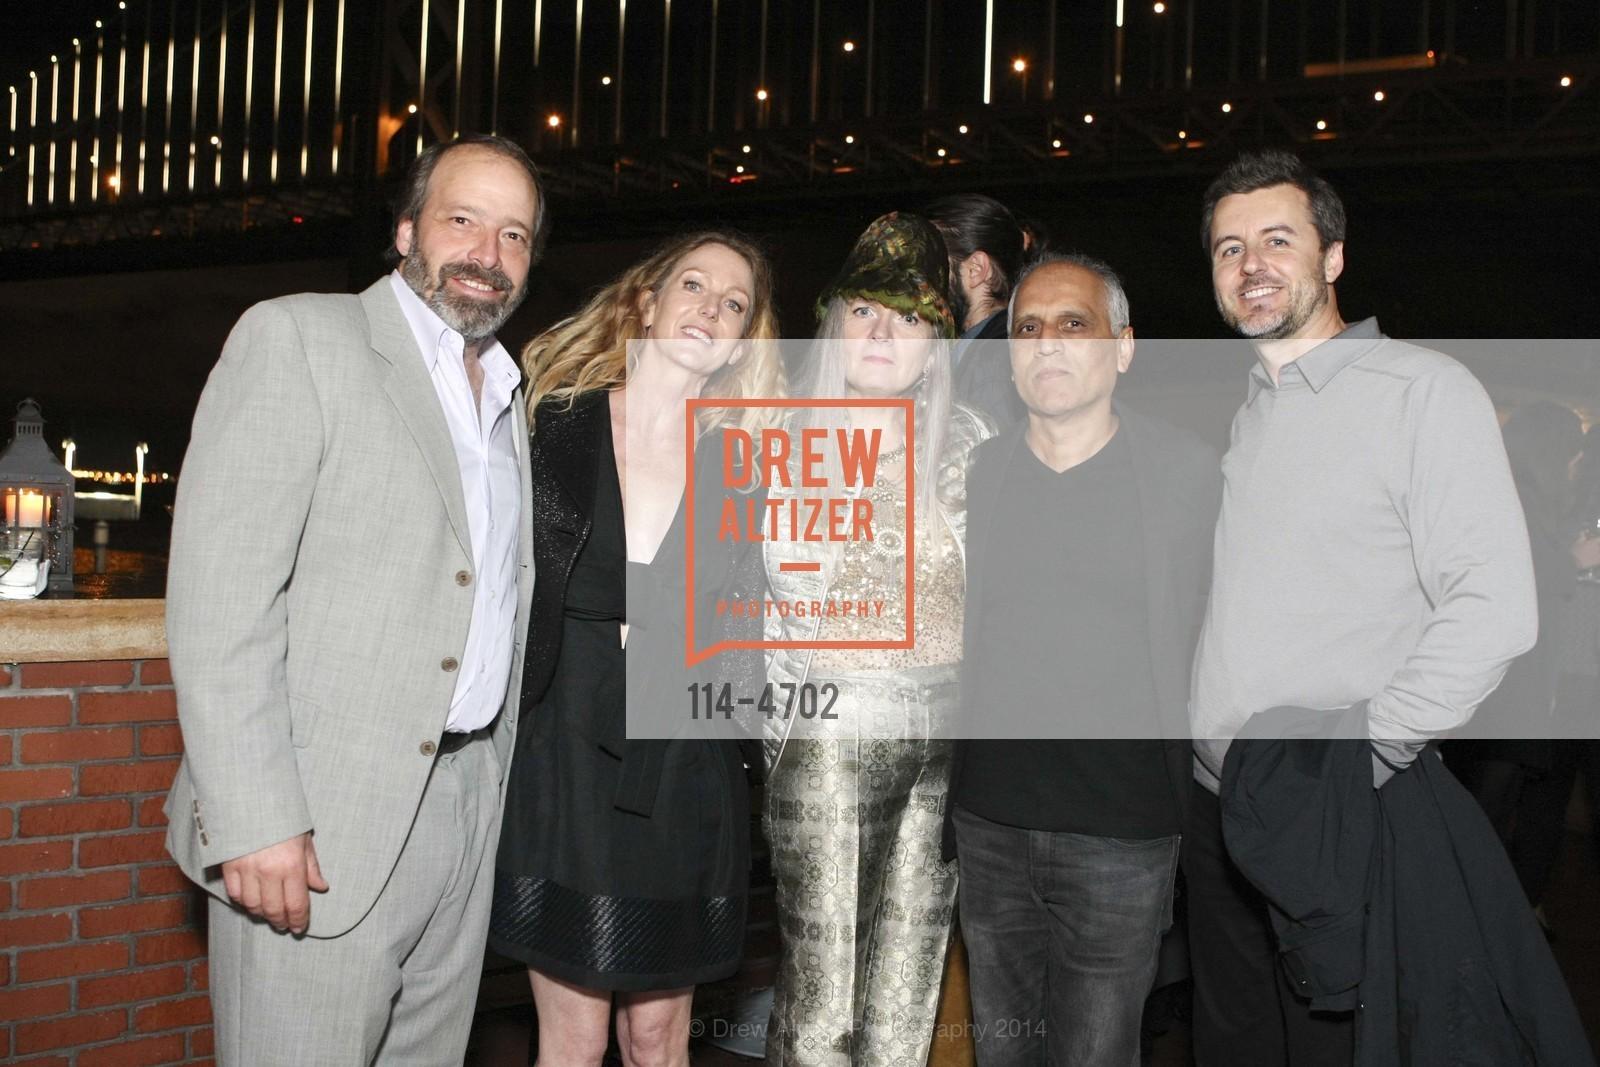 Evan Shivley, Linda Morgan, Madeleine Fitzpatrick, Zahid Sardar, Gregory Herman, Photo #114-4702